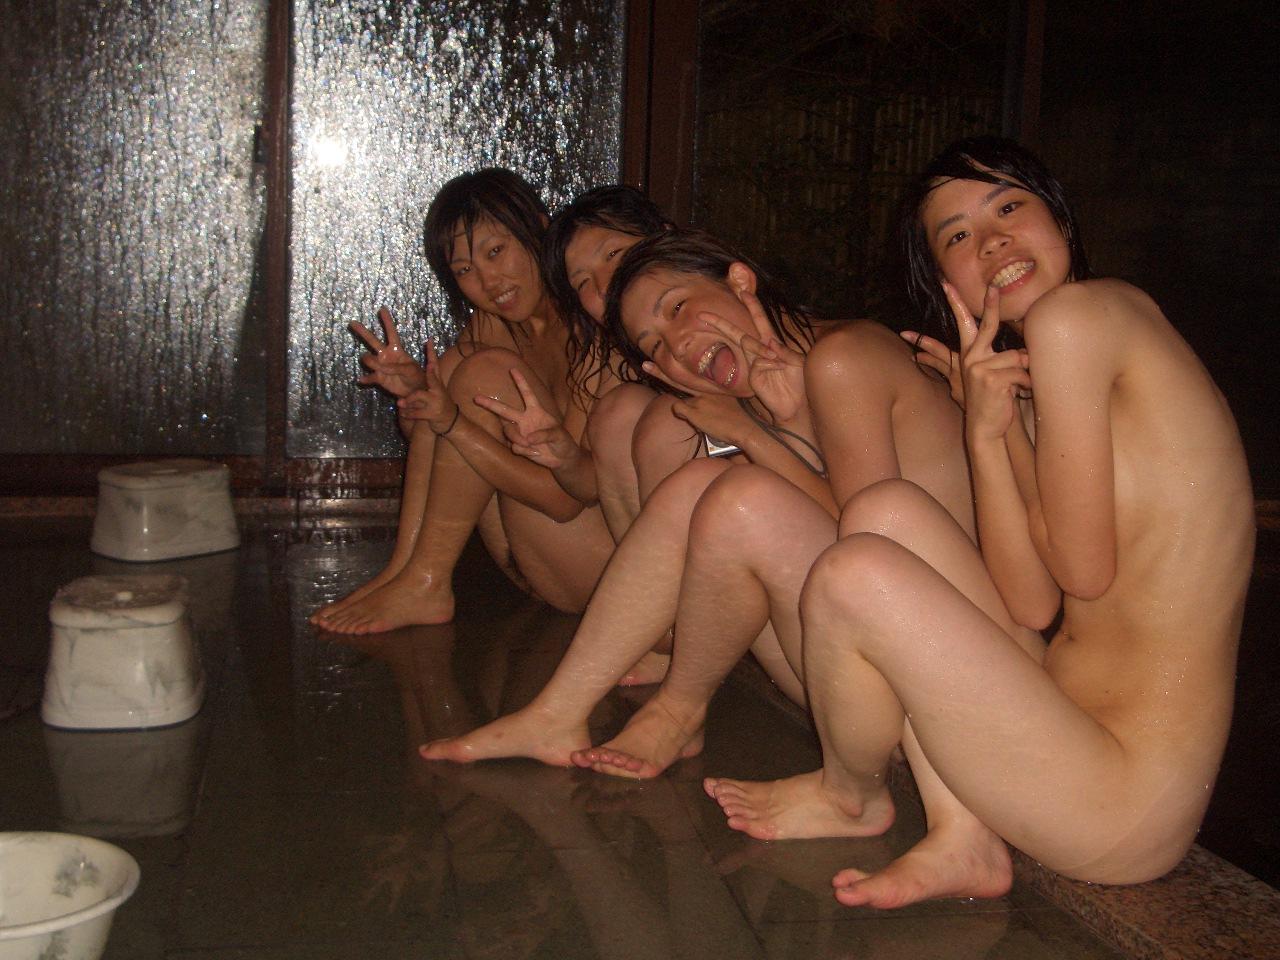 Lovely Japanese Schoolgirls Excursion Naked Photos Leaked -8617